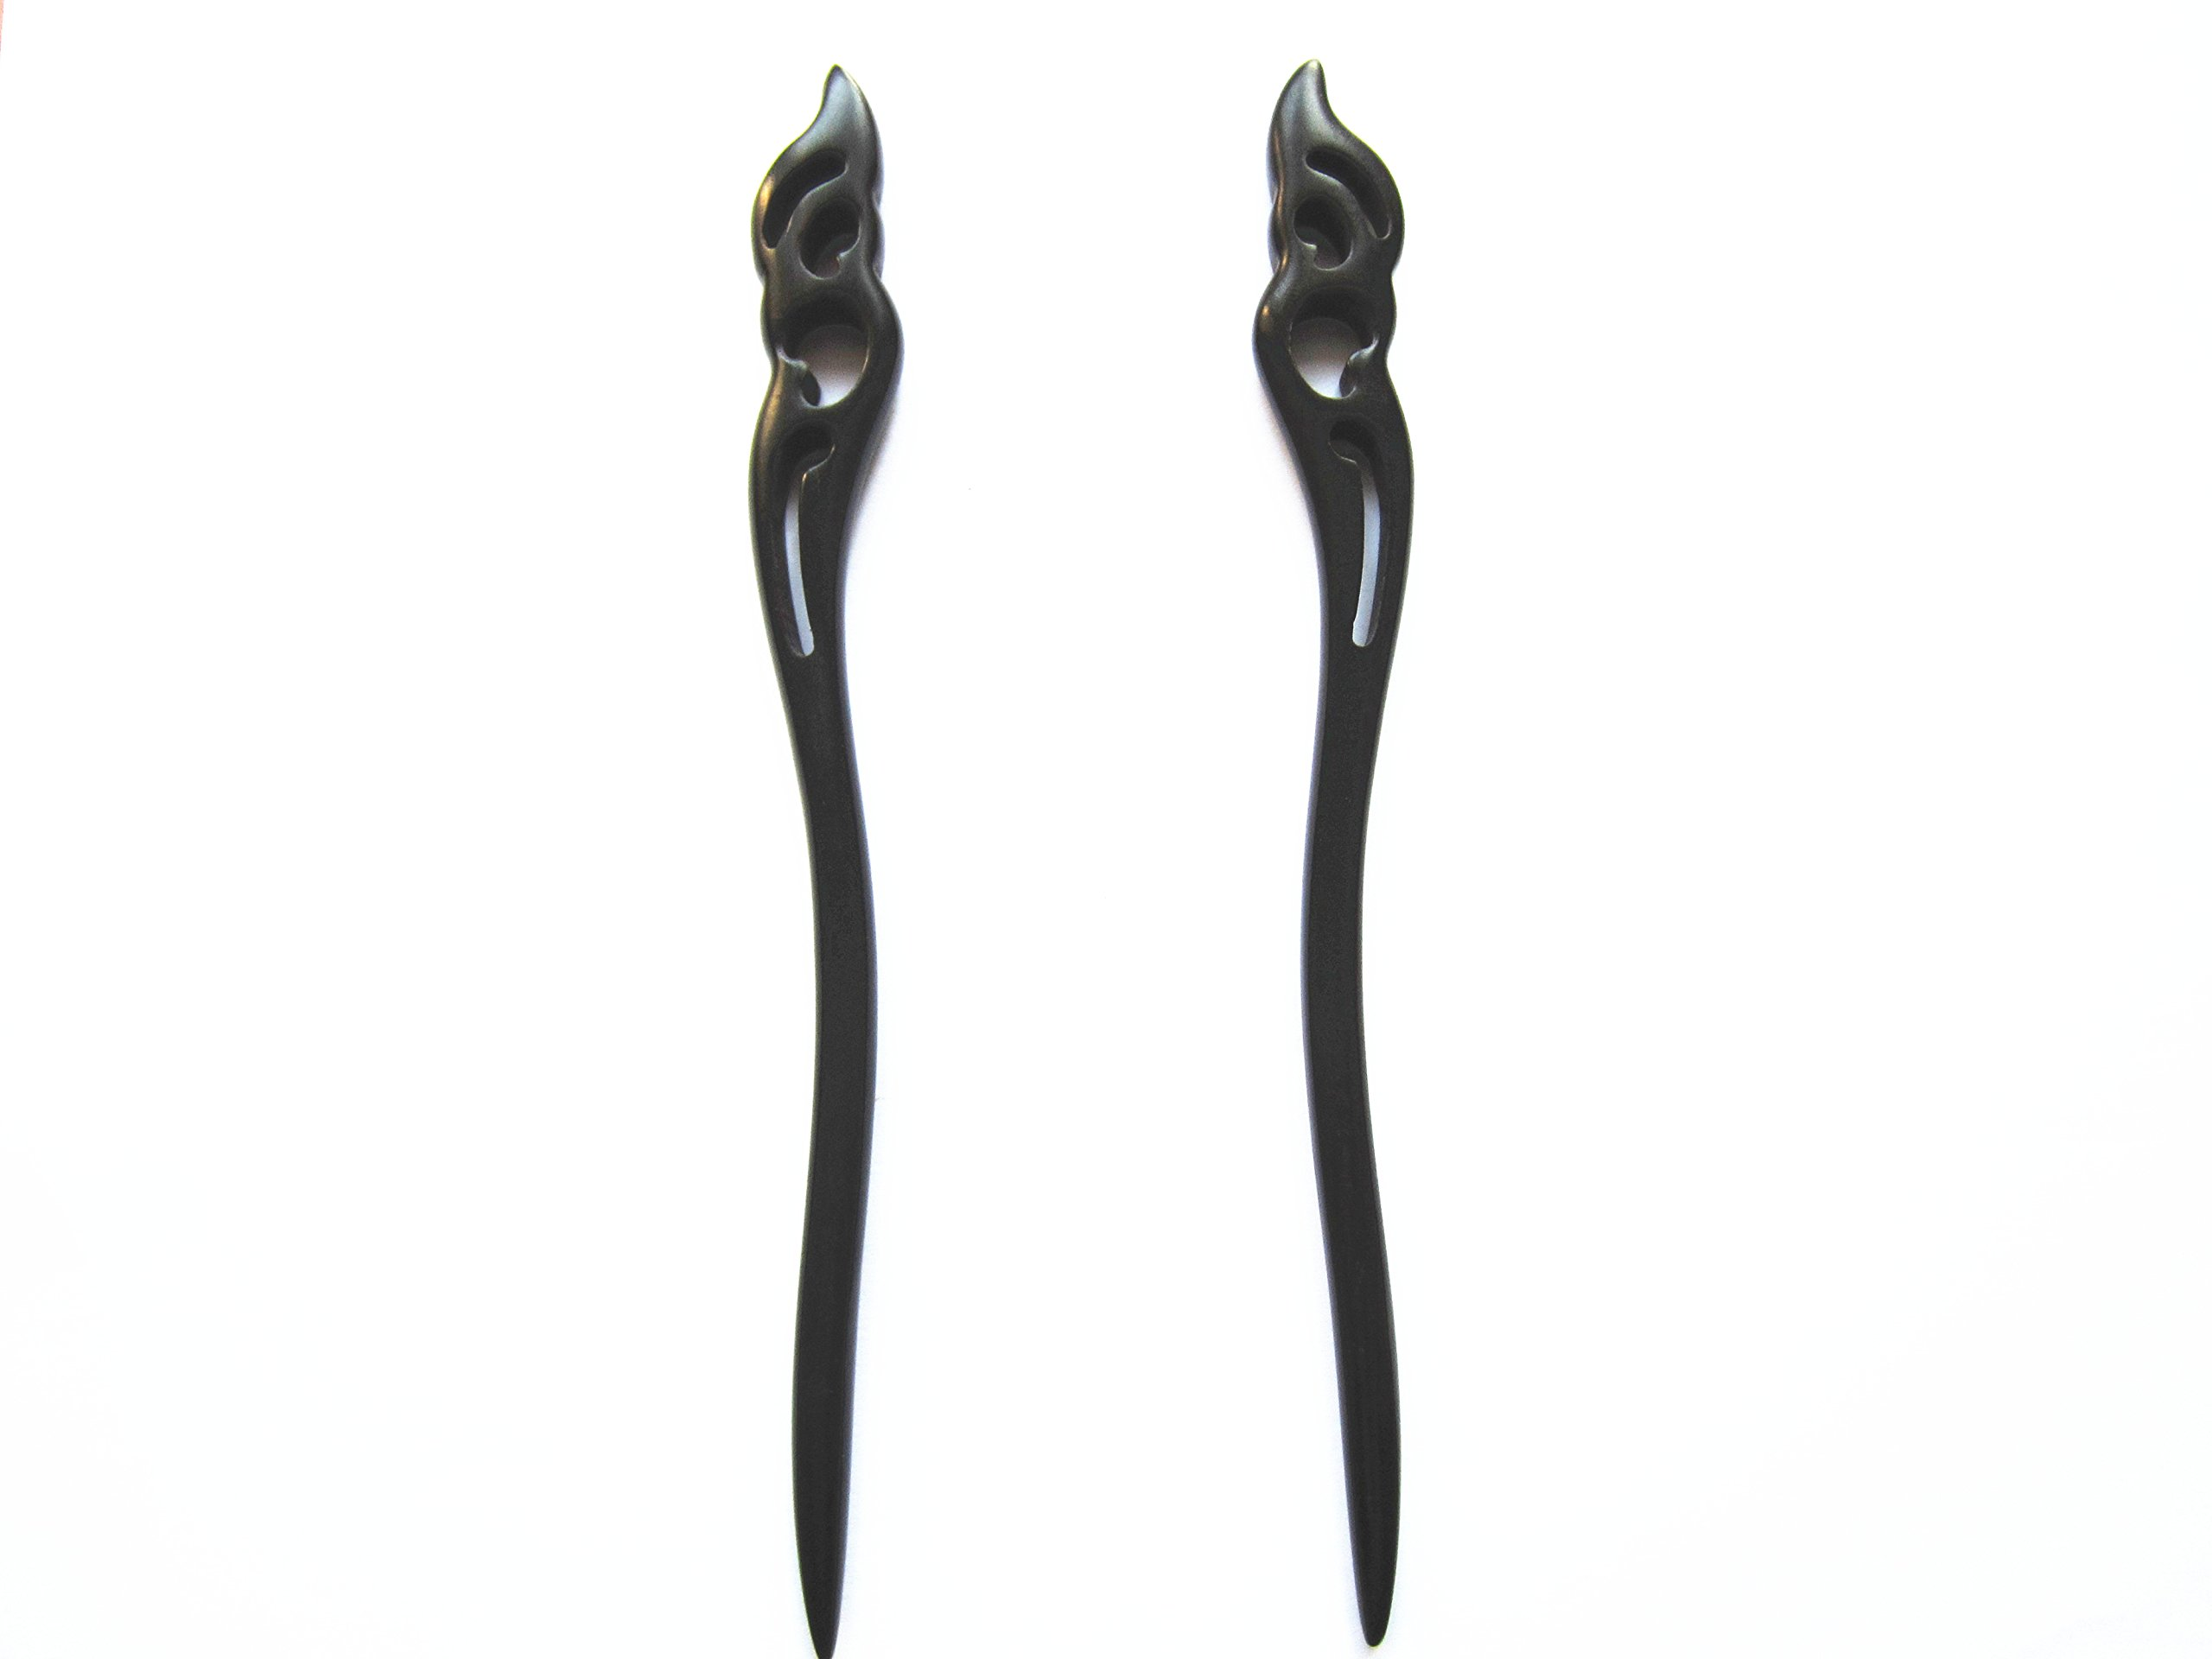 Myhsmooth Zz-bg-moon 2 Count Hair Sticks Natural Black Sandalwood(ebony) Handmade Carved Hair Clip Shawl Hair Pins Pack of 2 Pcs :Hold the Moon